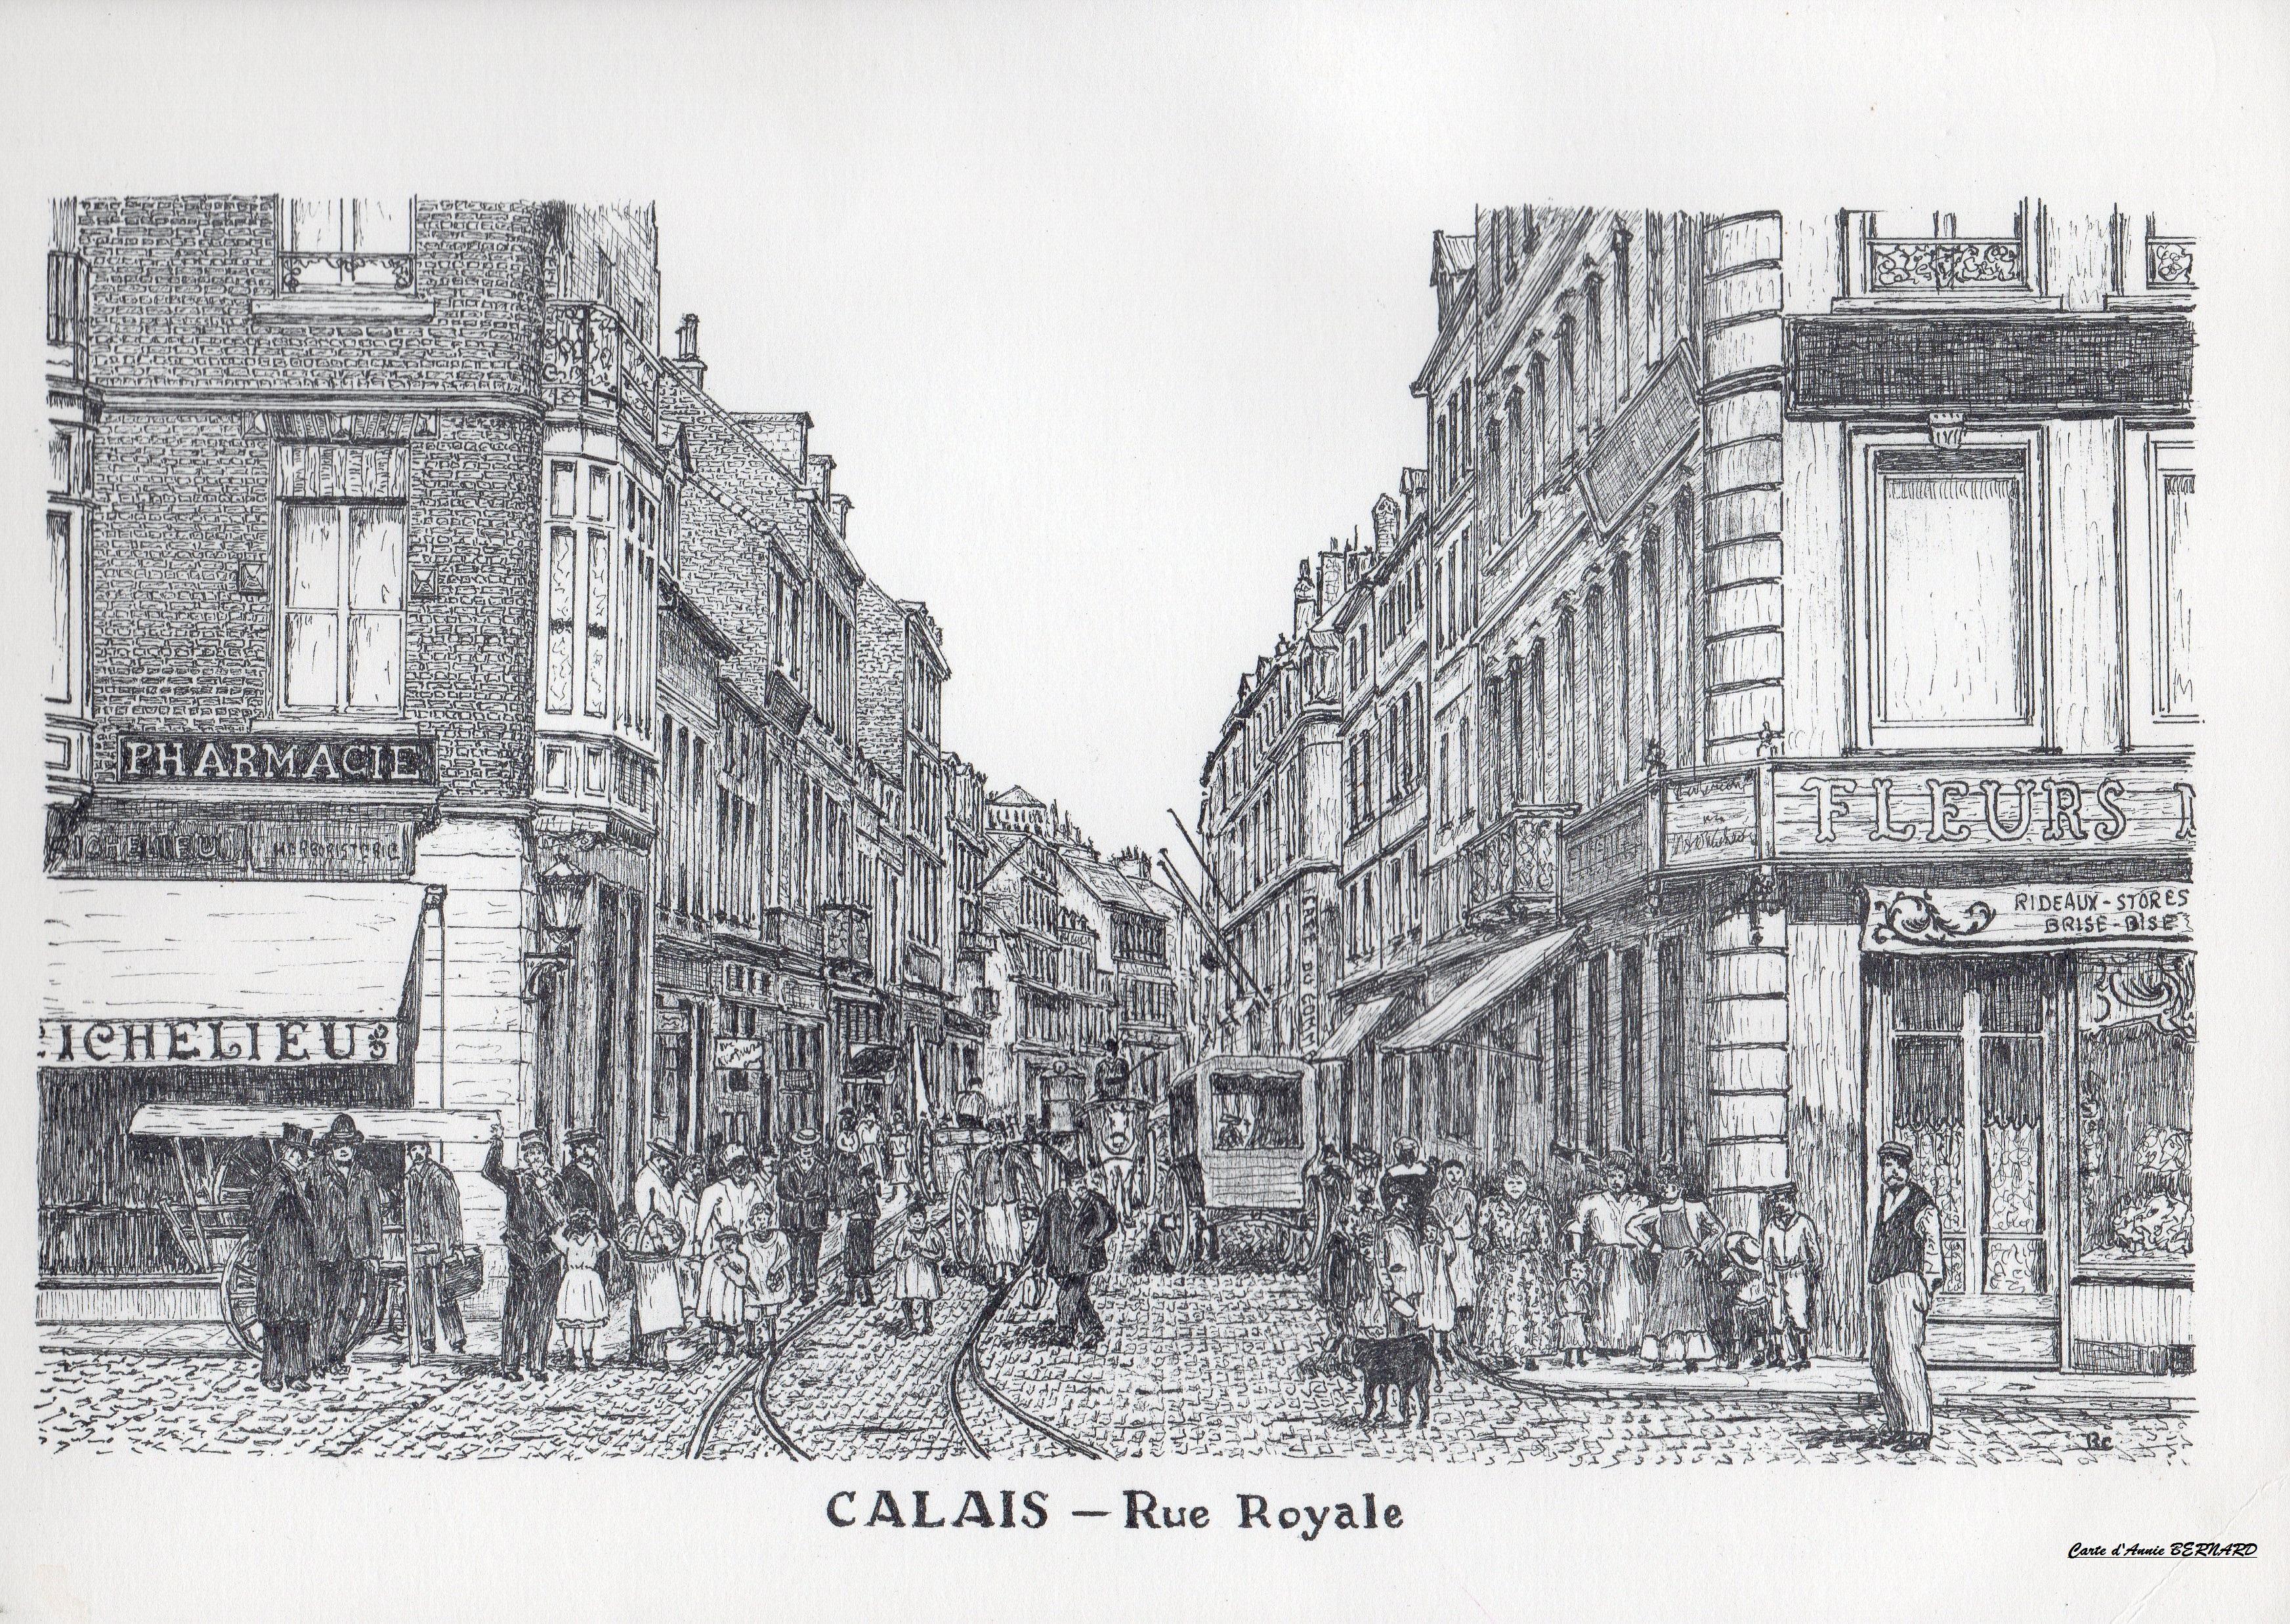 Calais rétro, rue Royale